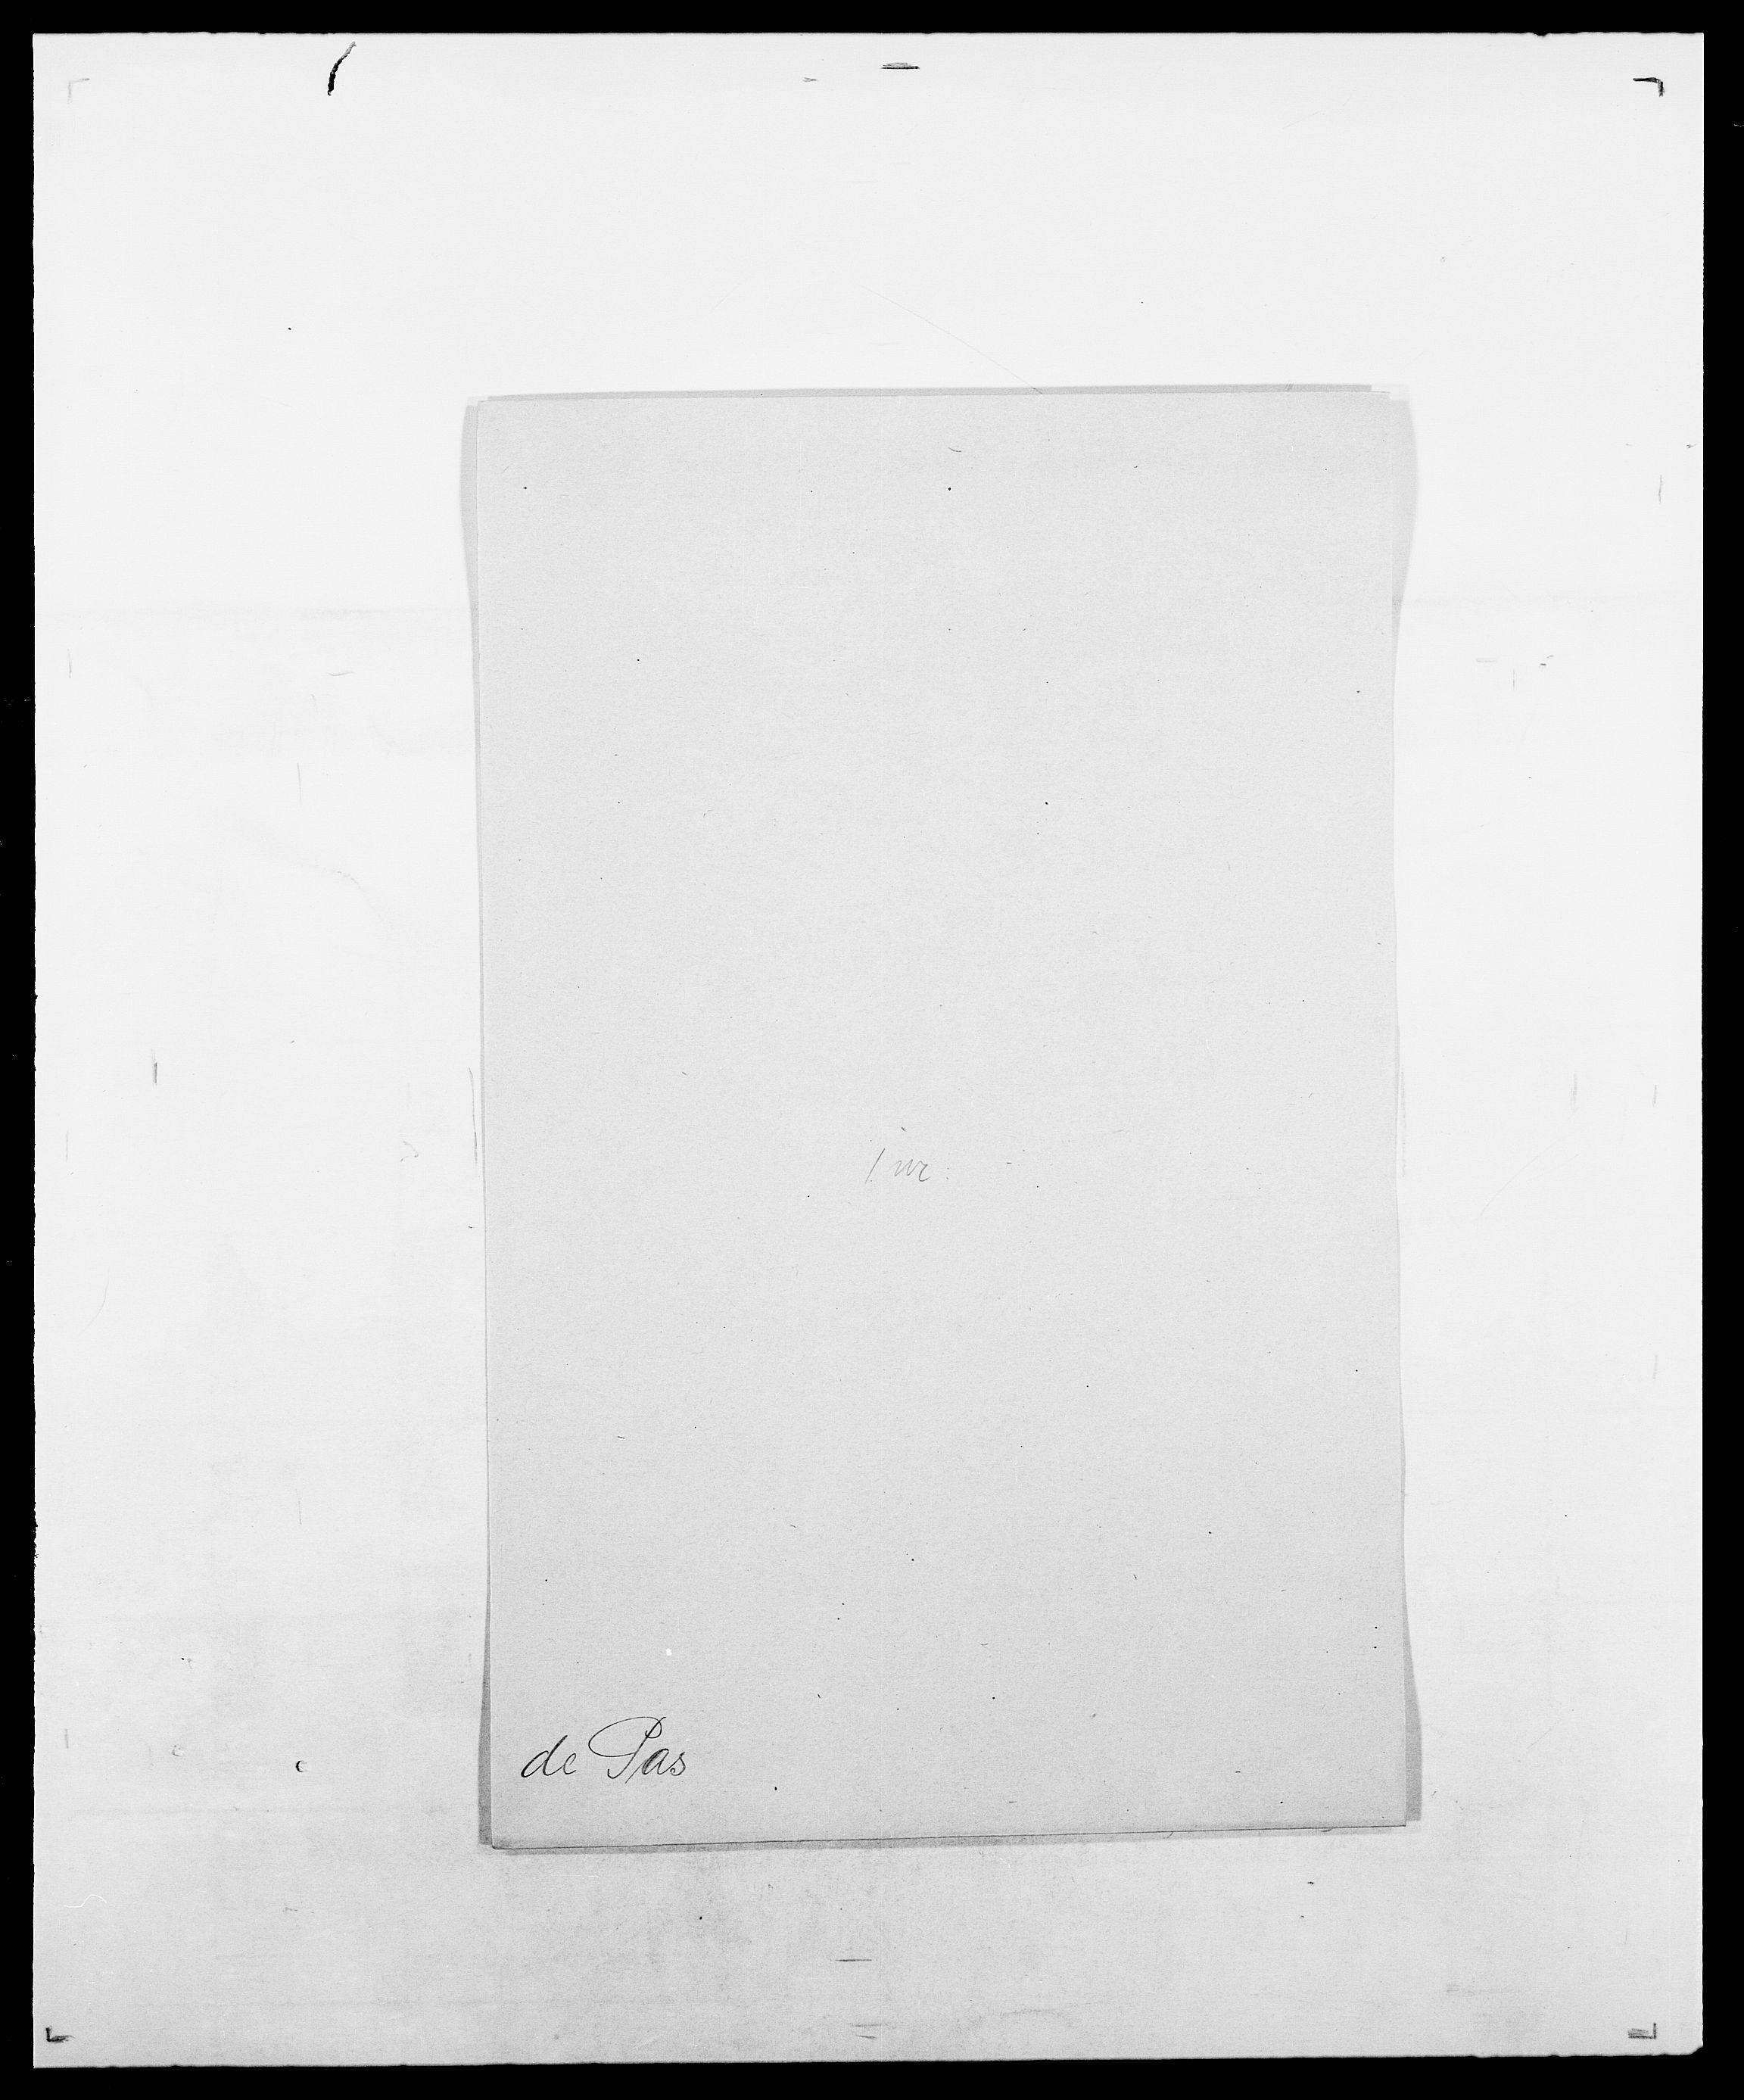 SAO, Delgobe, Charles Antoine - samling, D/Da/L0030: Paars - Pittelkov, s. 139